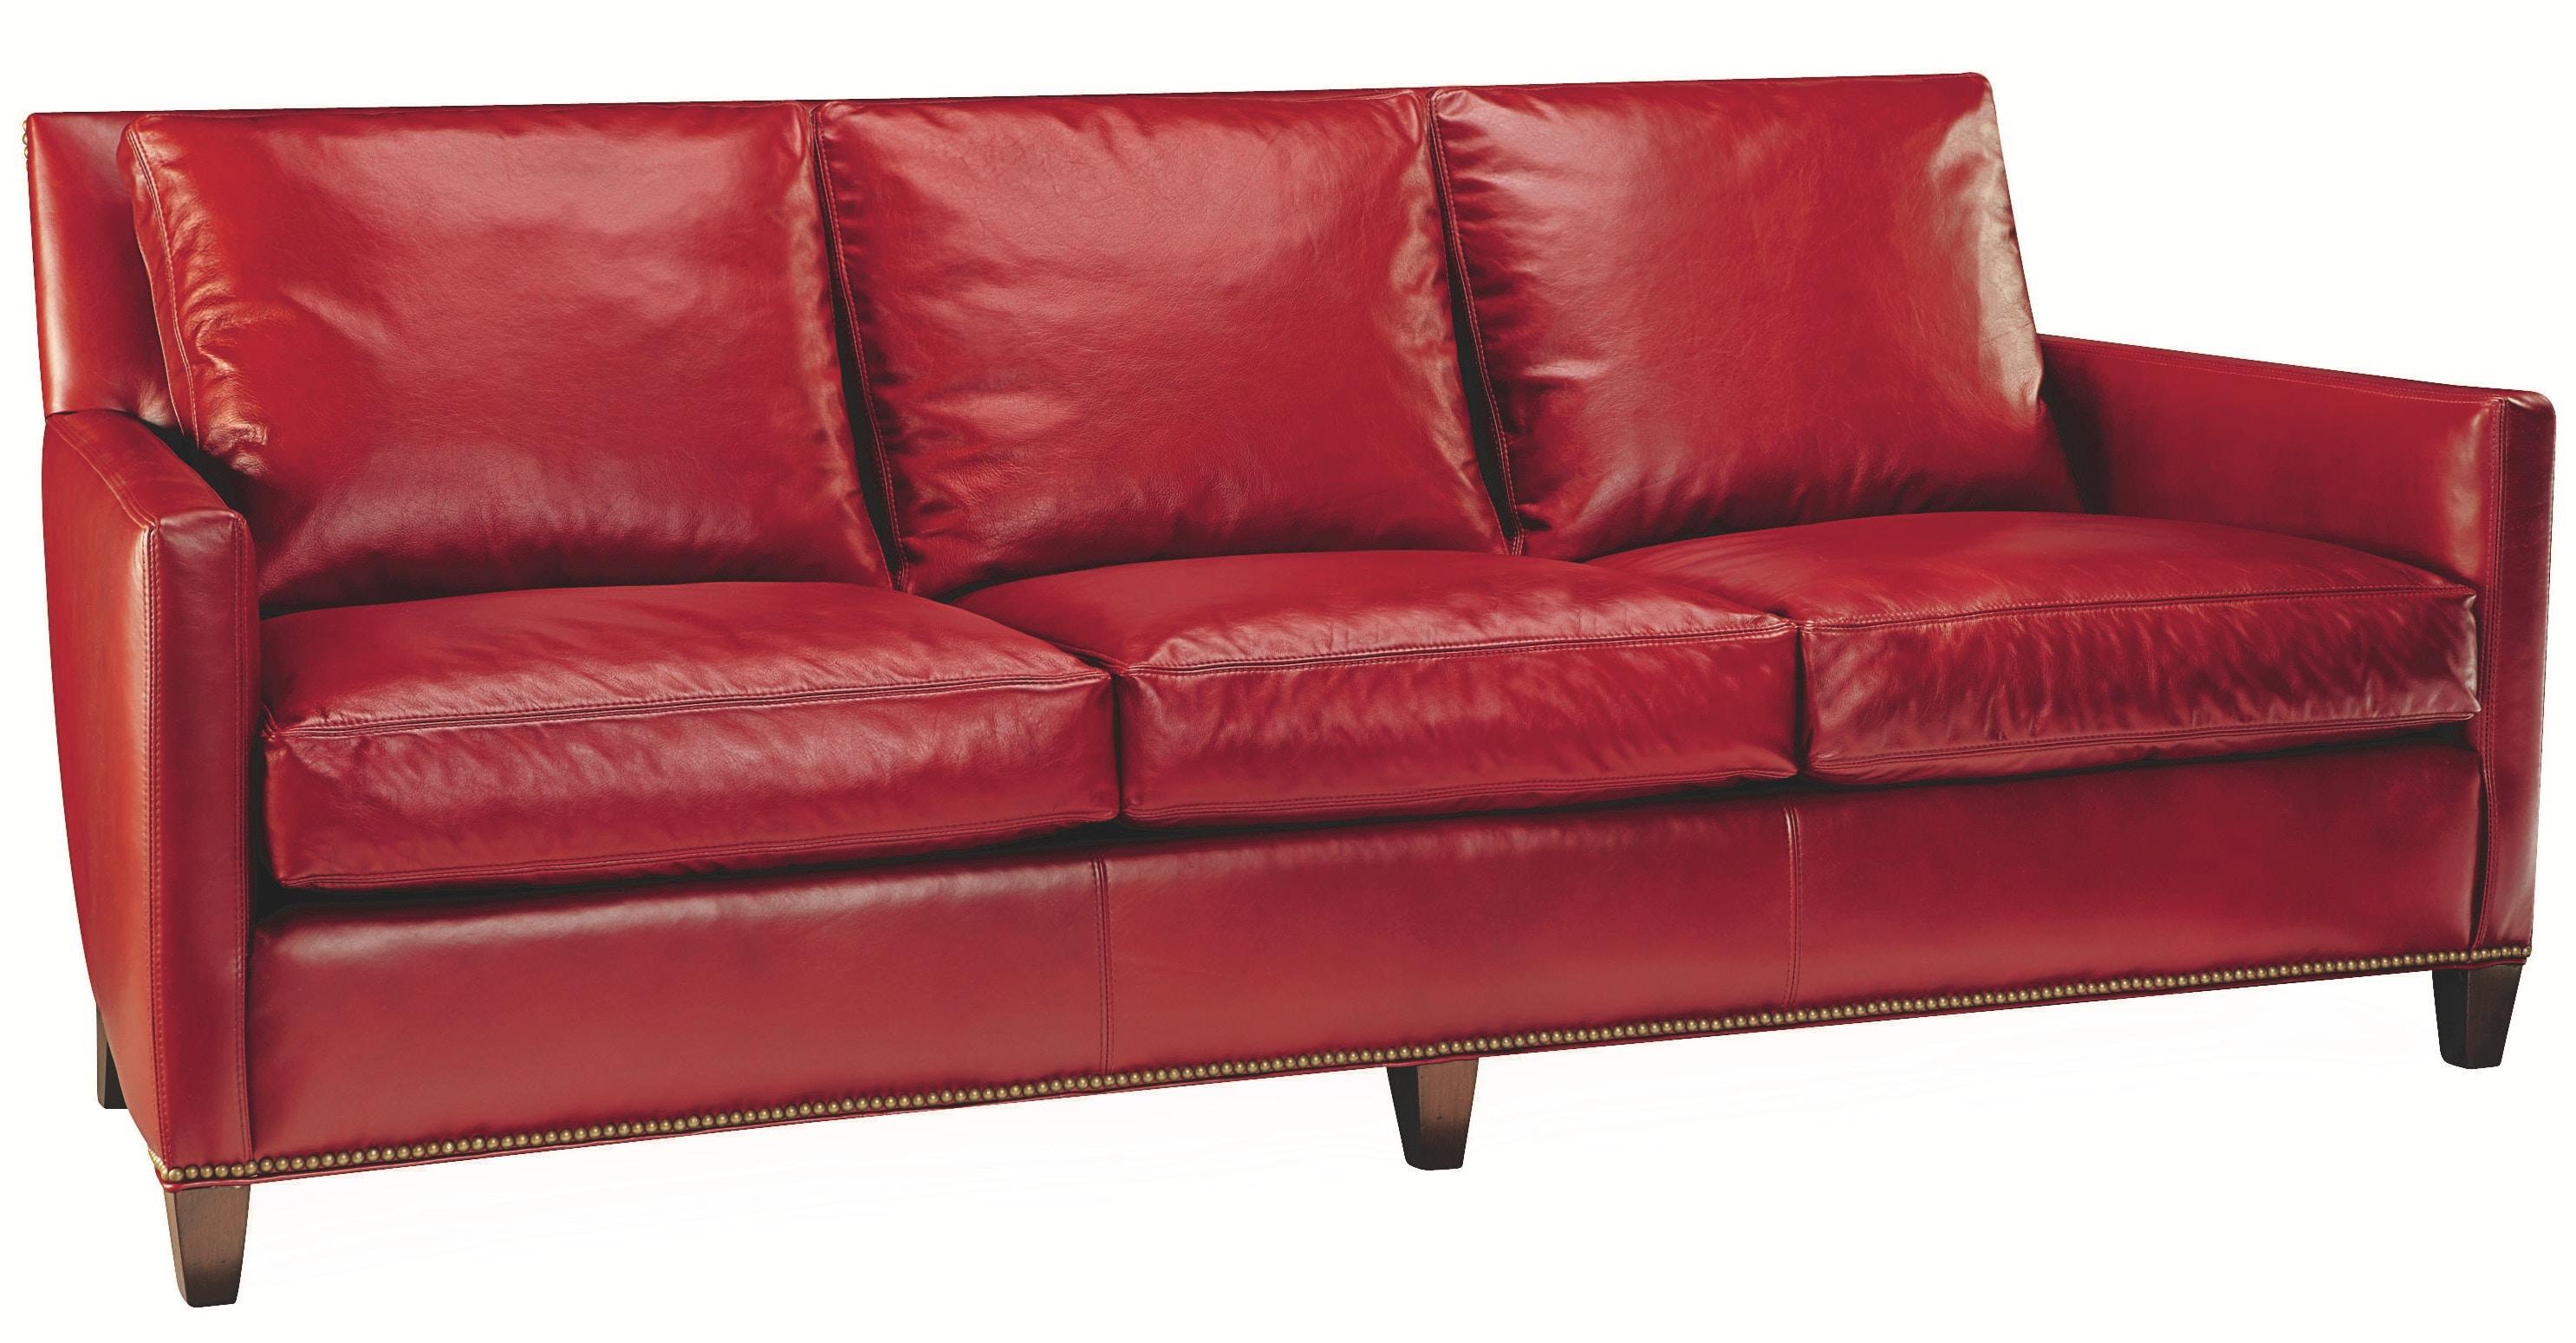 Lee Industries Living Room Leather Sofa L1296 03 At Oasis Rug U0026 Home